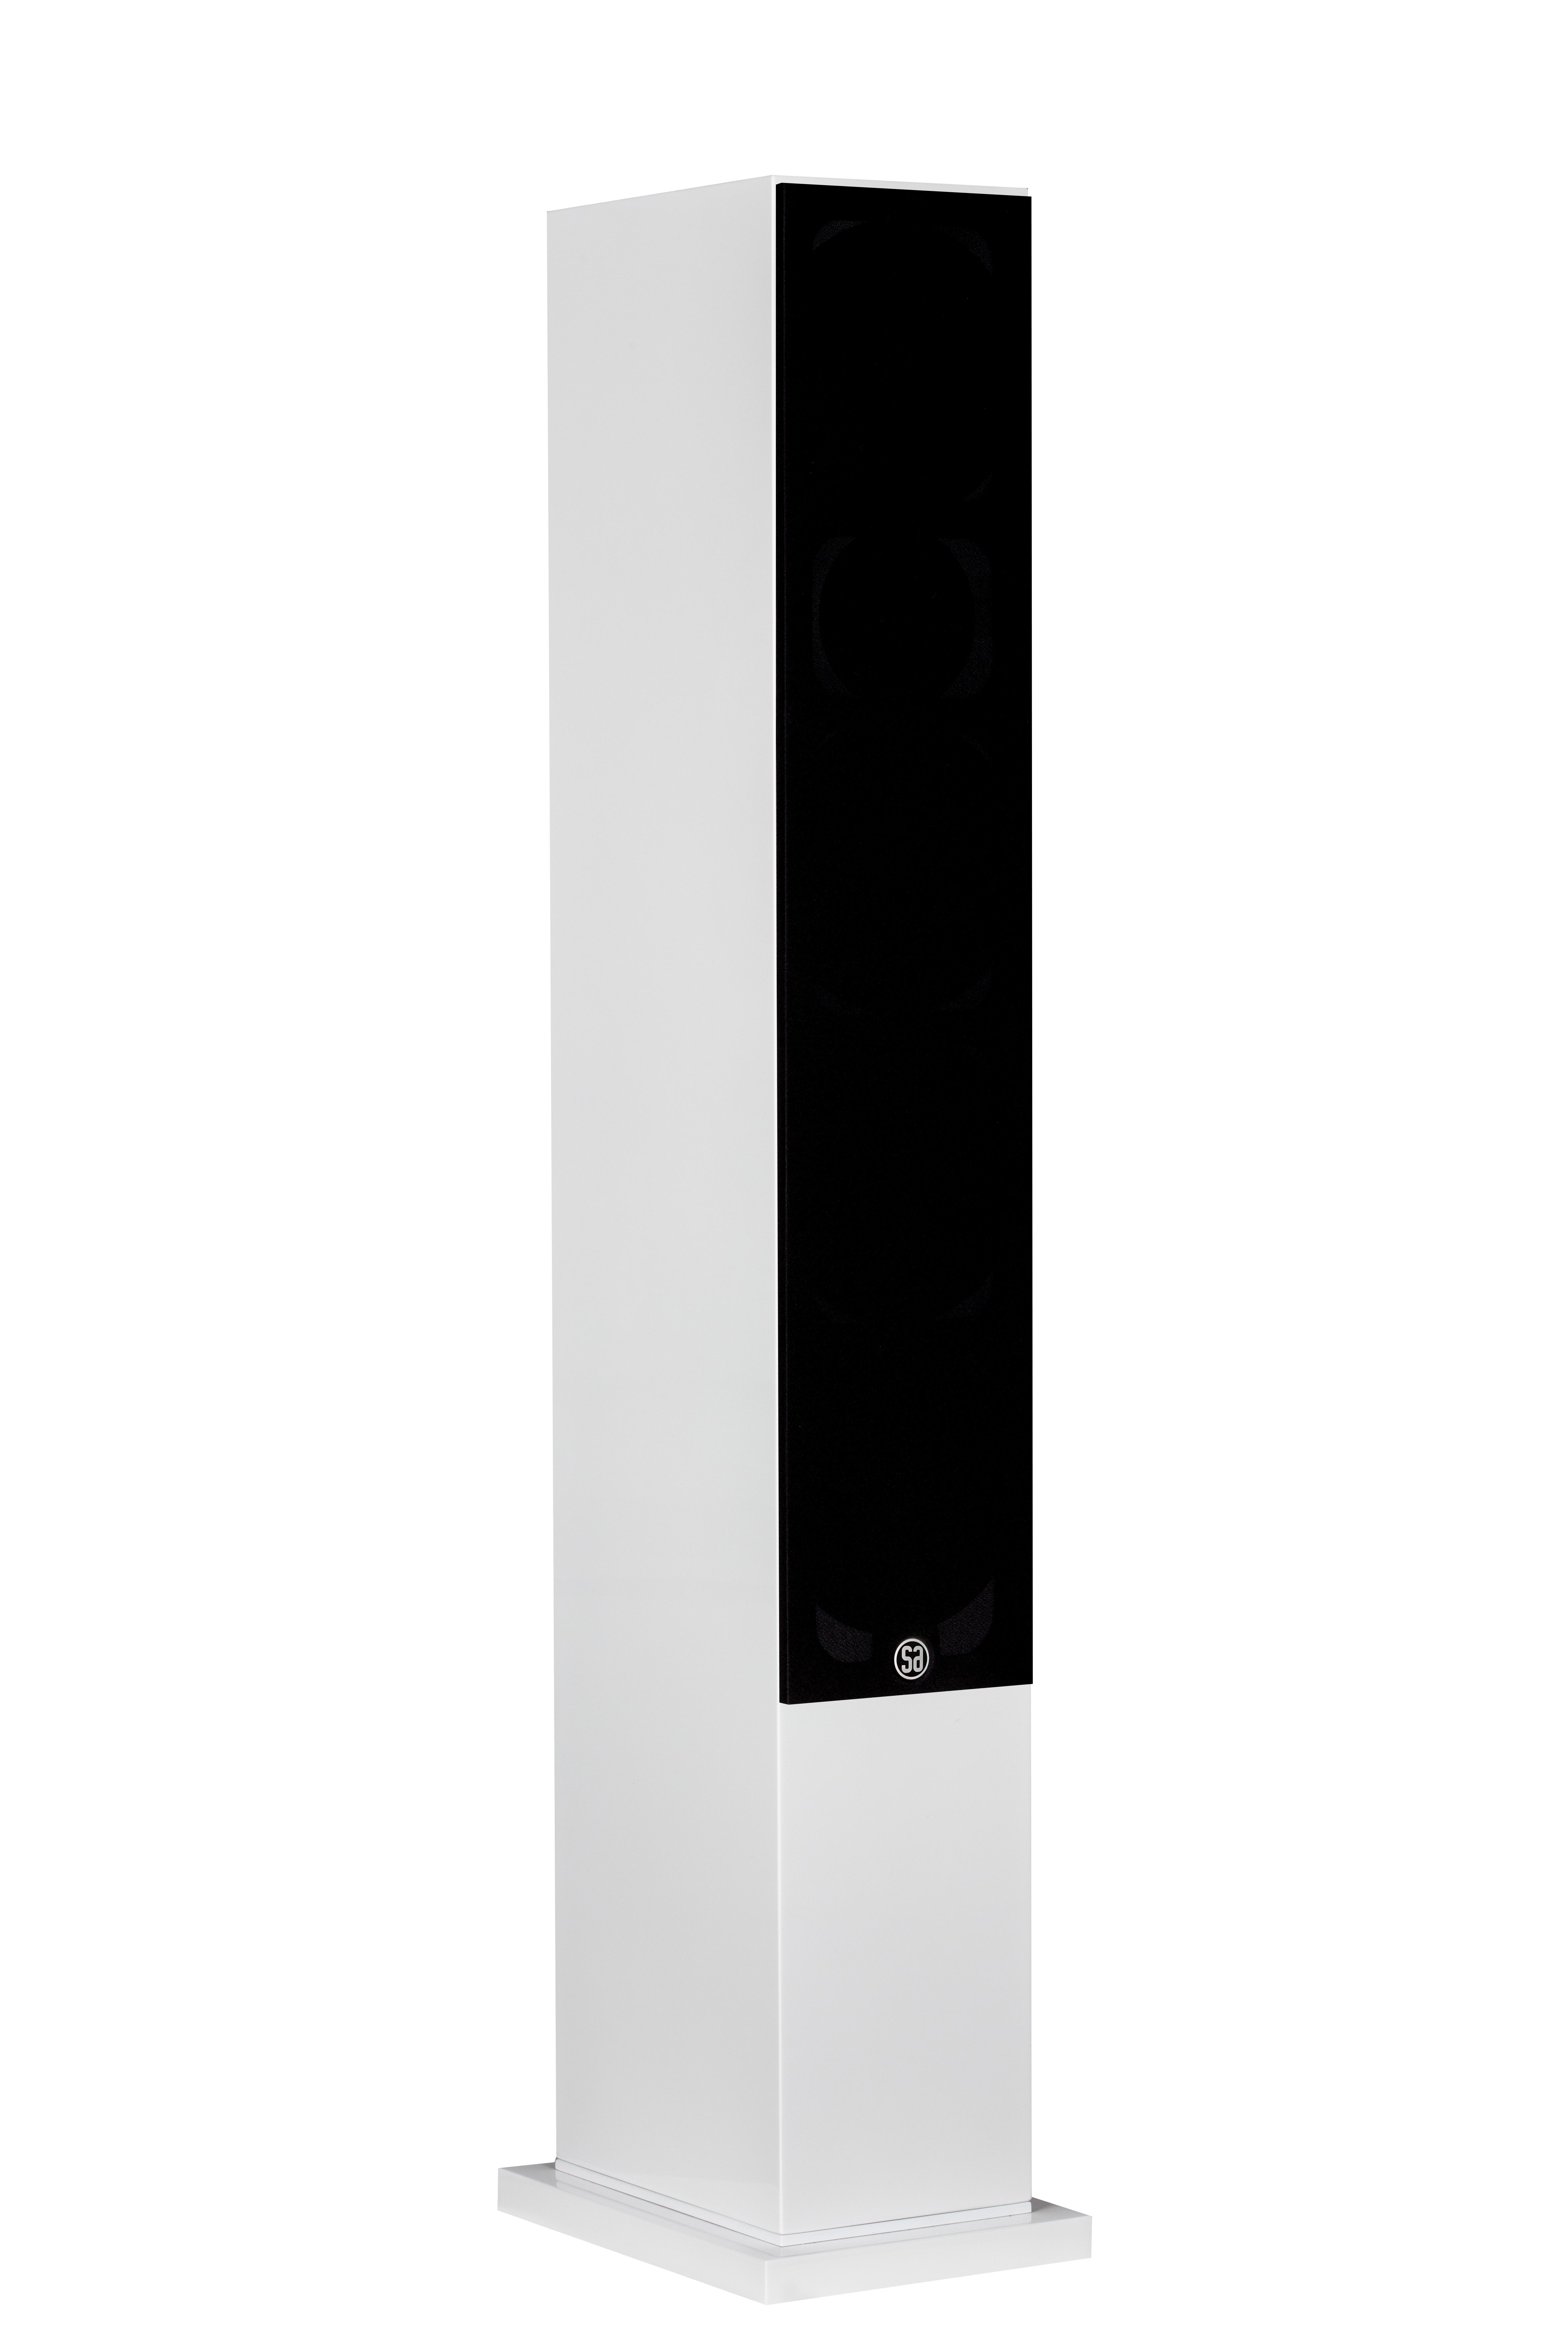 System Audio Saxo 70 Kolor: Czarny